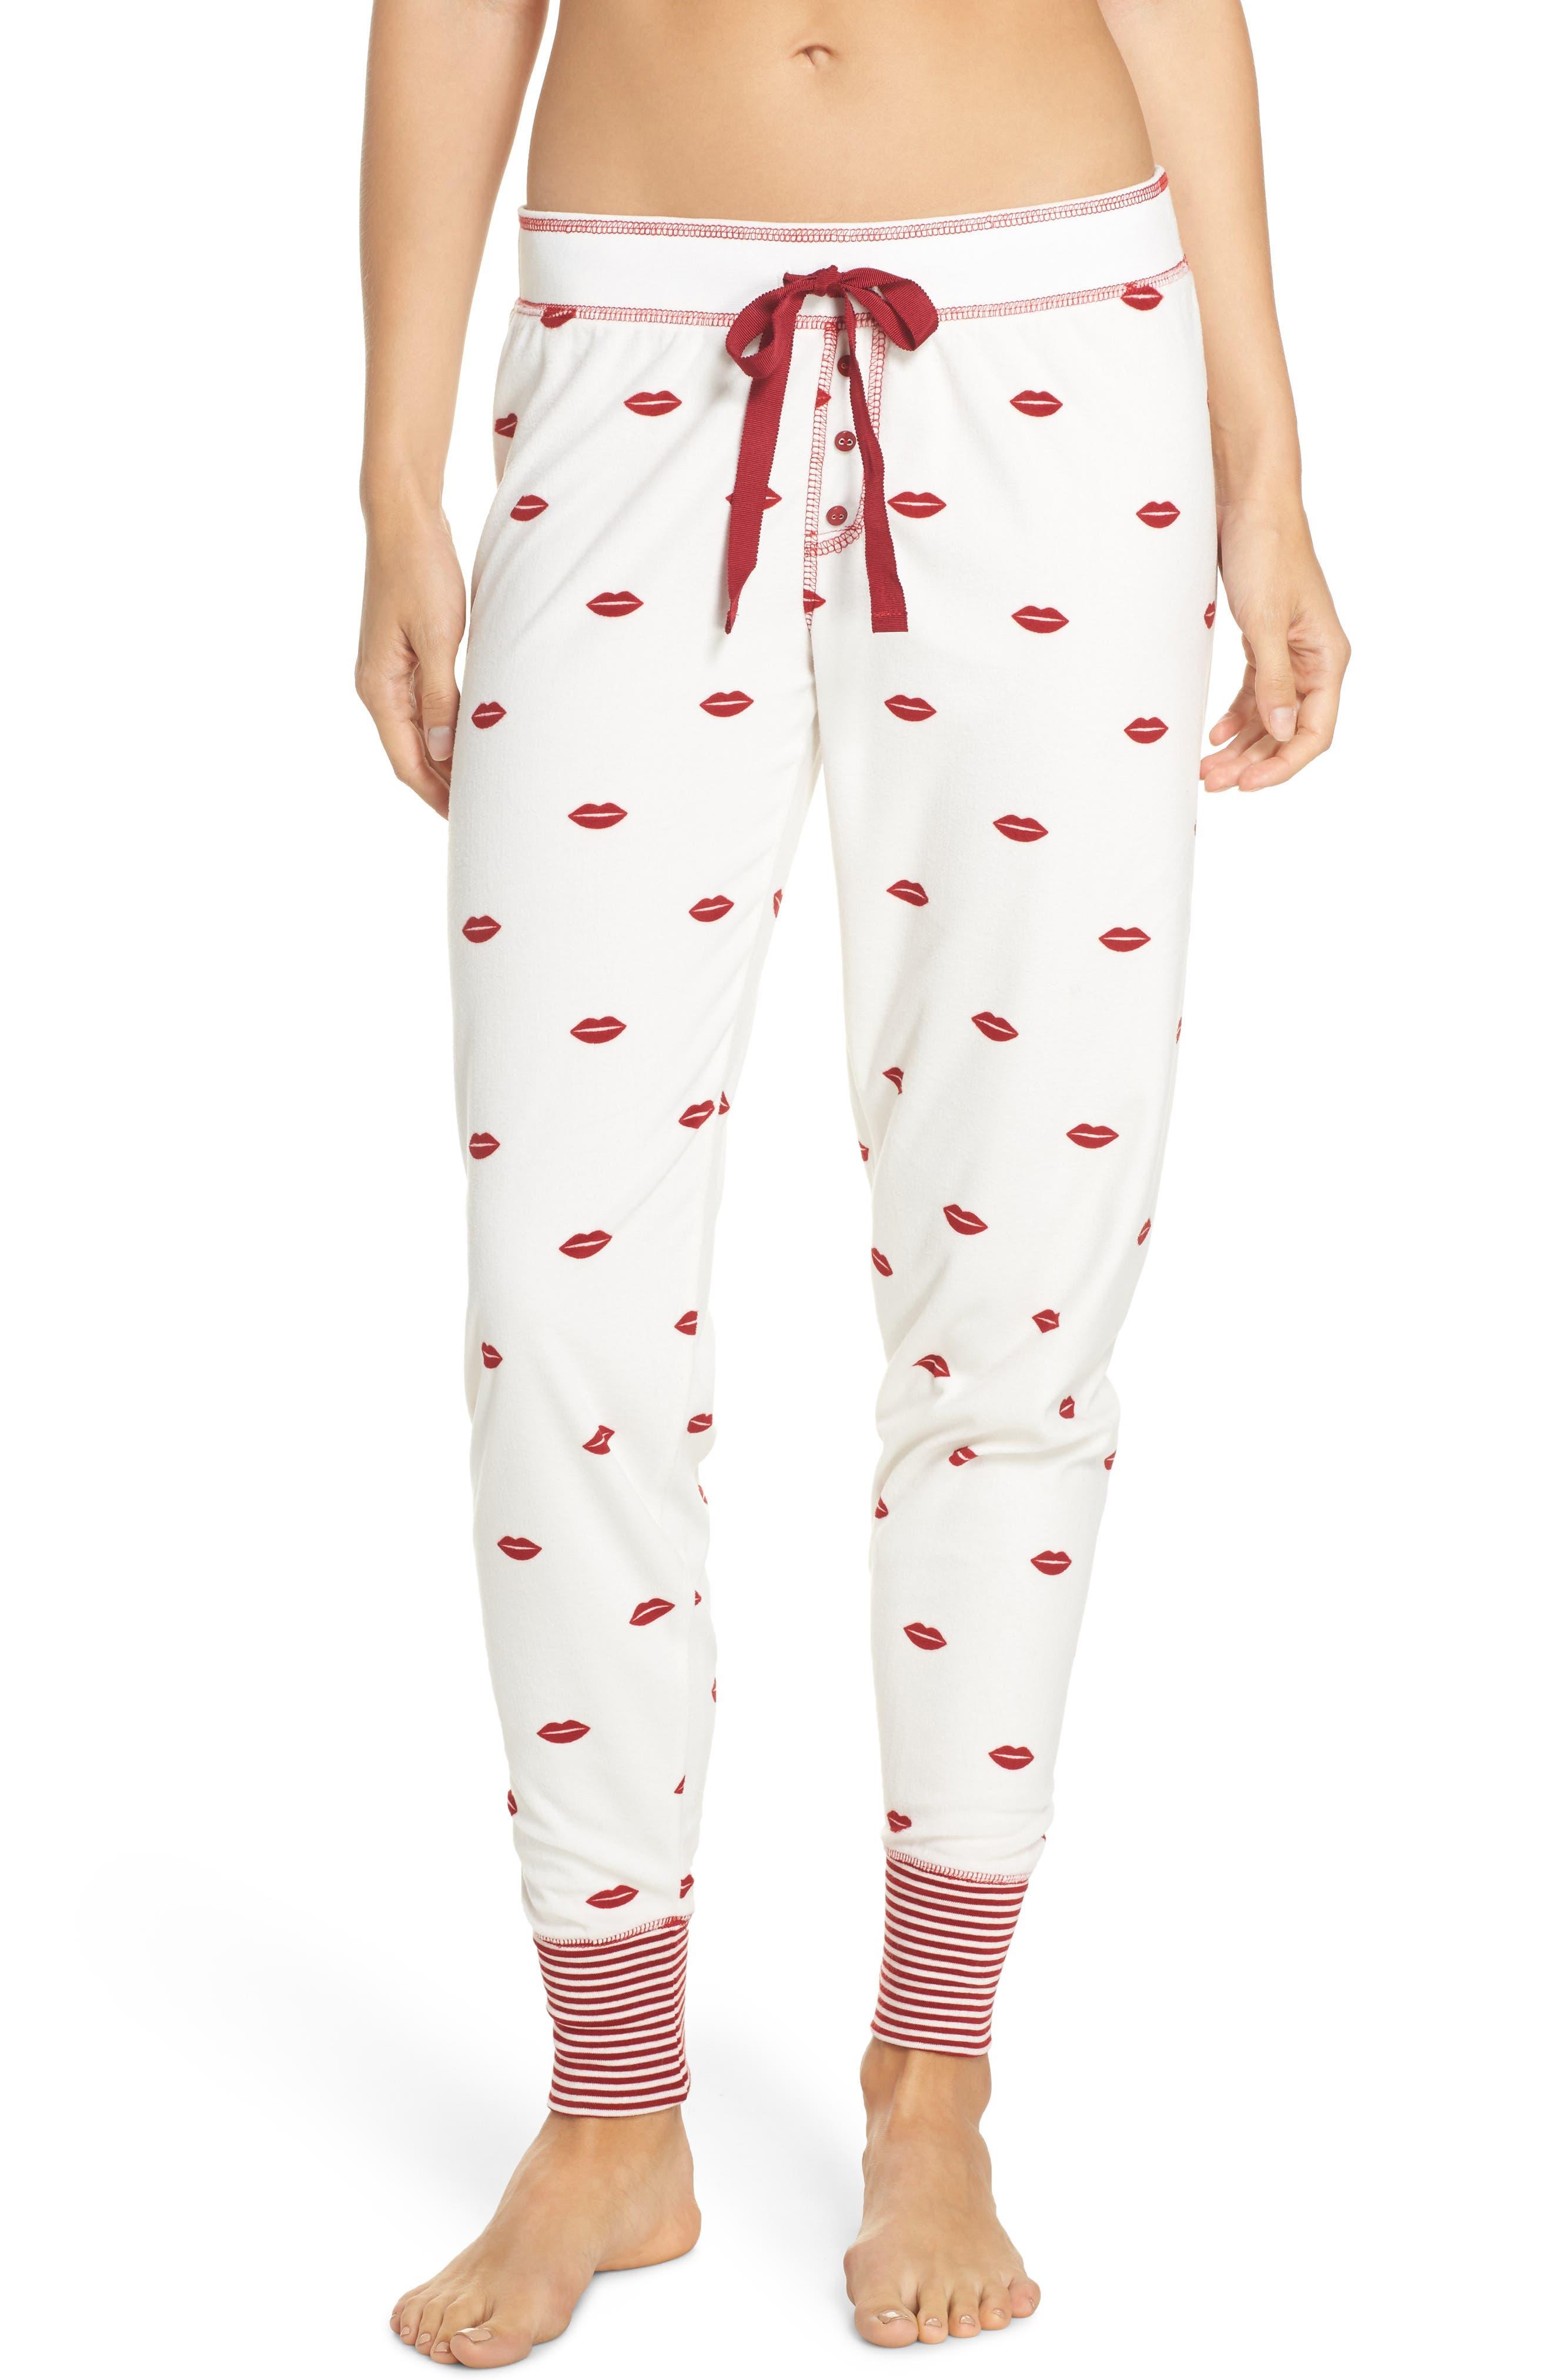 PJ SALVAGE, Lip Print Pajama Pants, Main thumbnail 1, color, 900